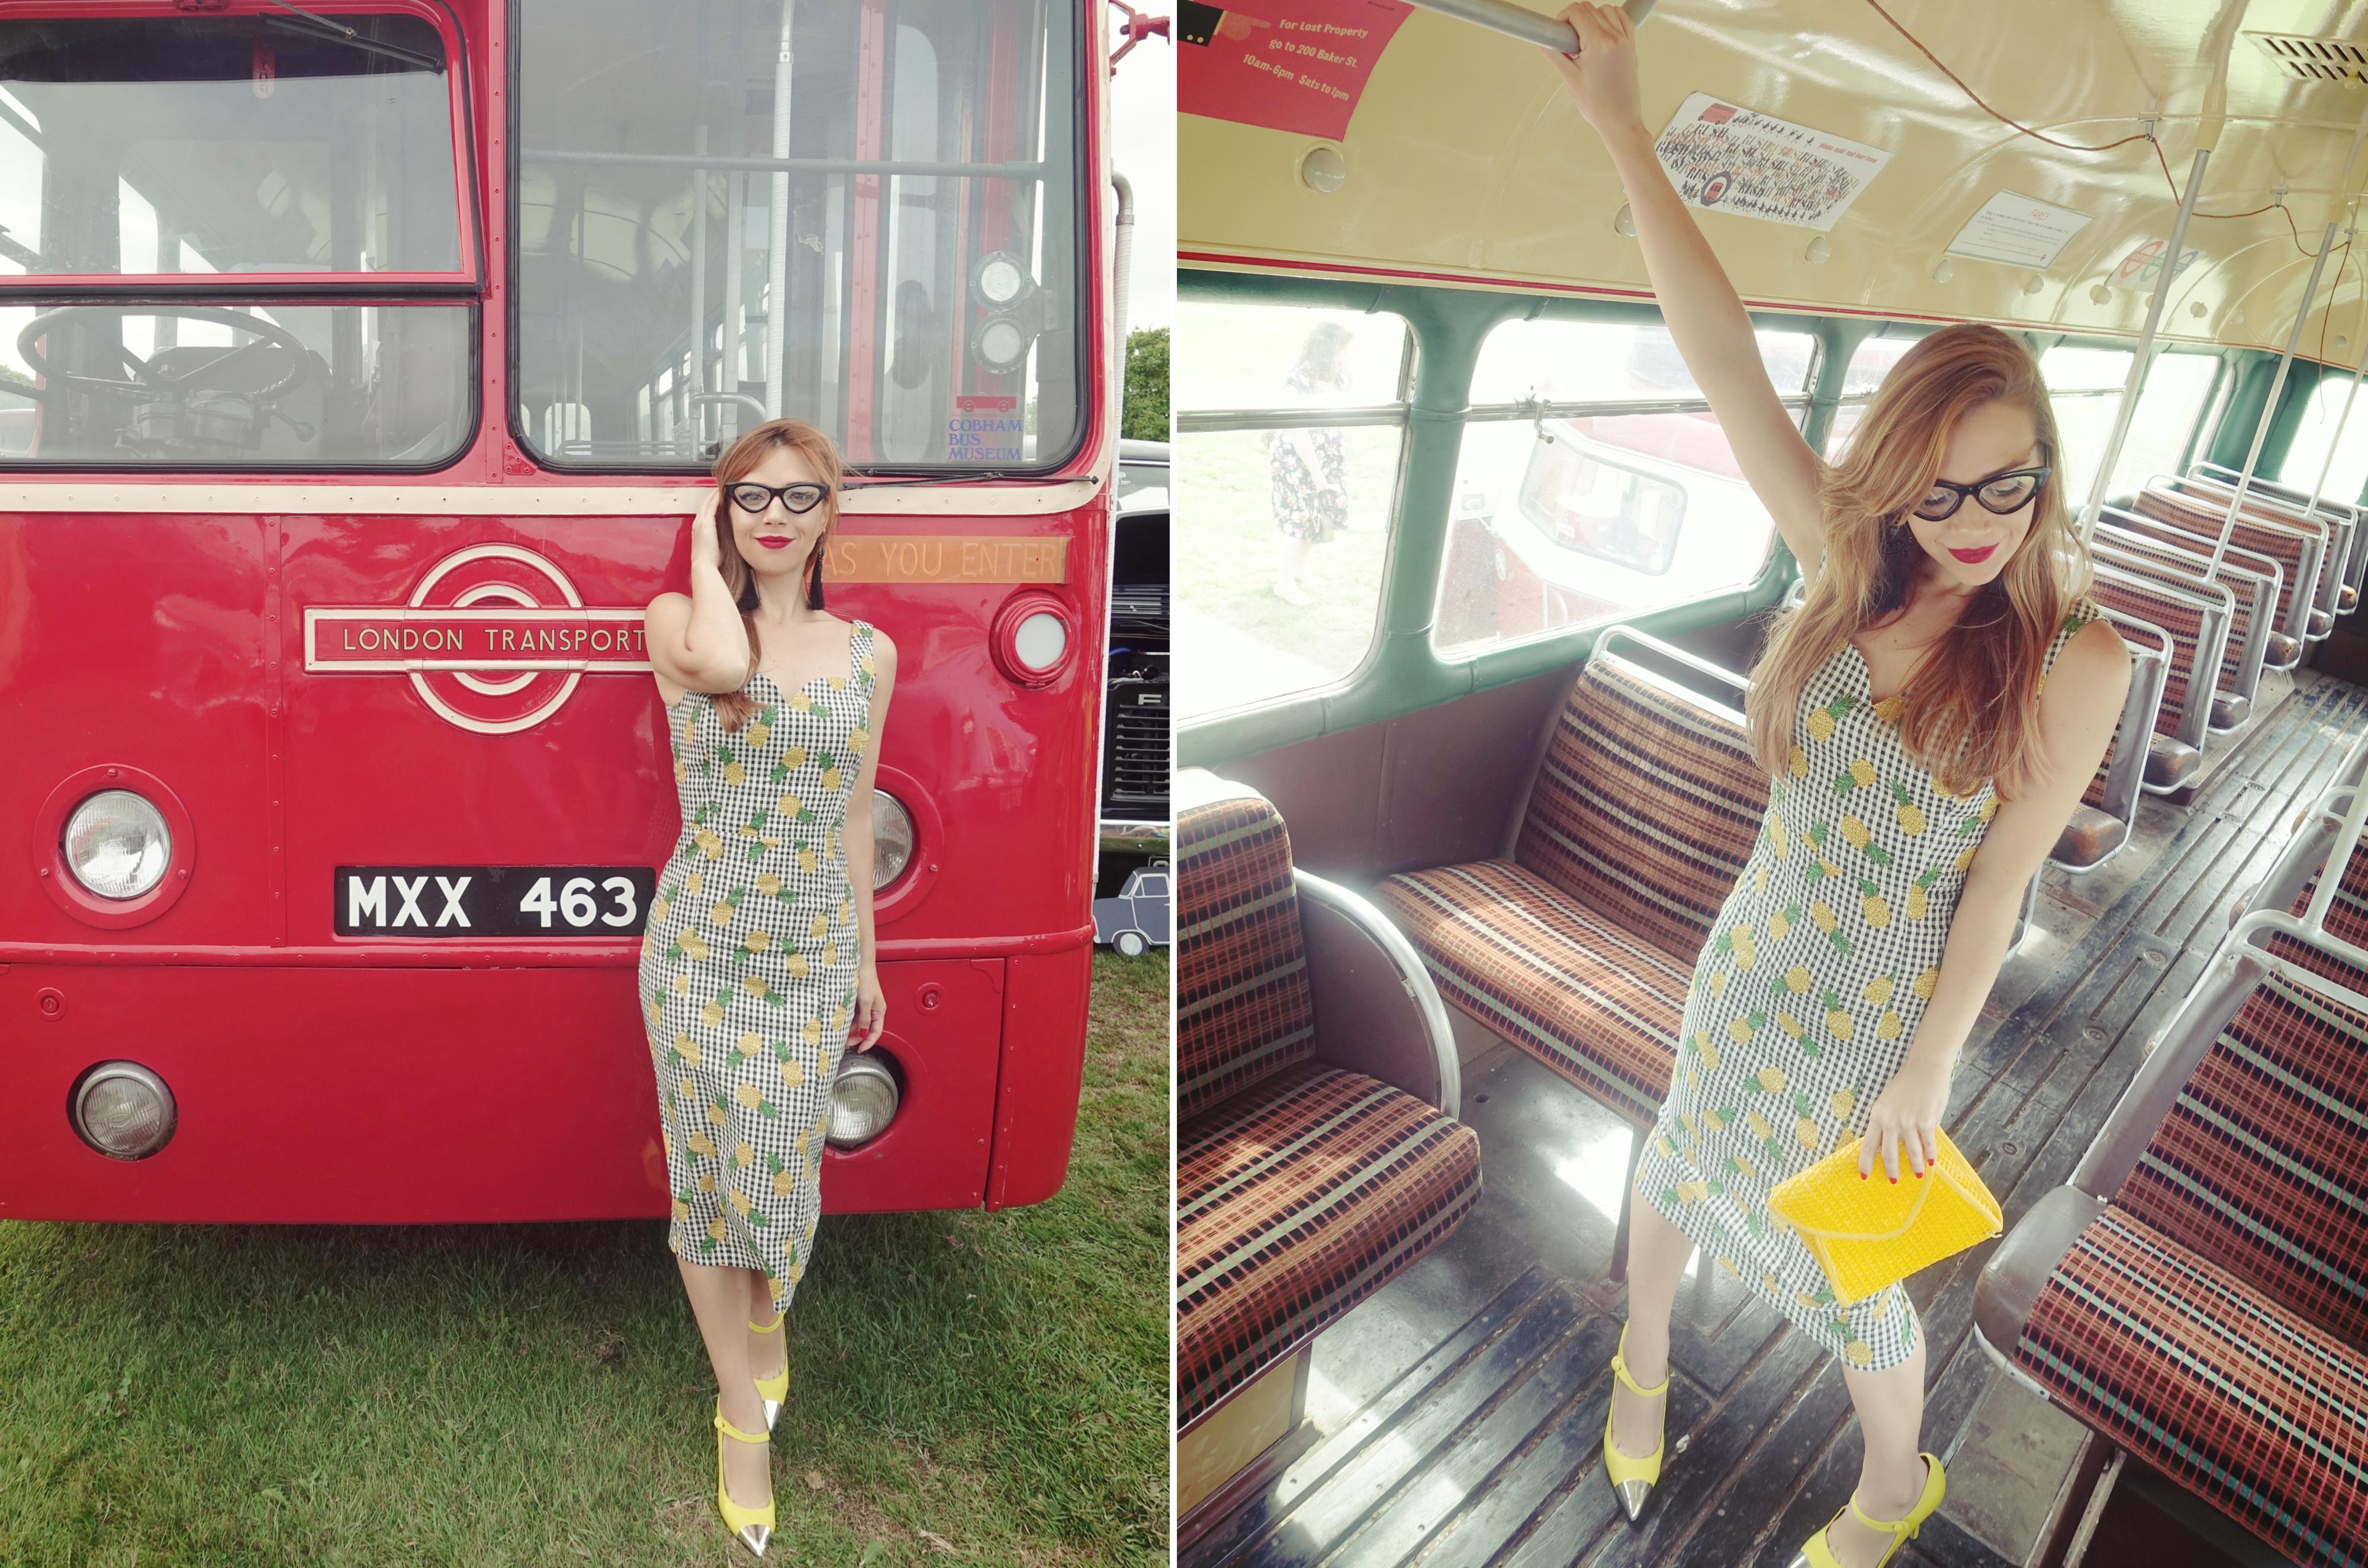 London-to-brighton-collectif-dresses-PiensaenChic-influencer-blog-de-moda-Chicadicta-vestidos-de-pinas-Chic-adicta-Piensa-en-Chic-yellow-outfit